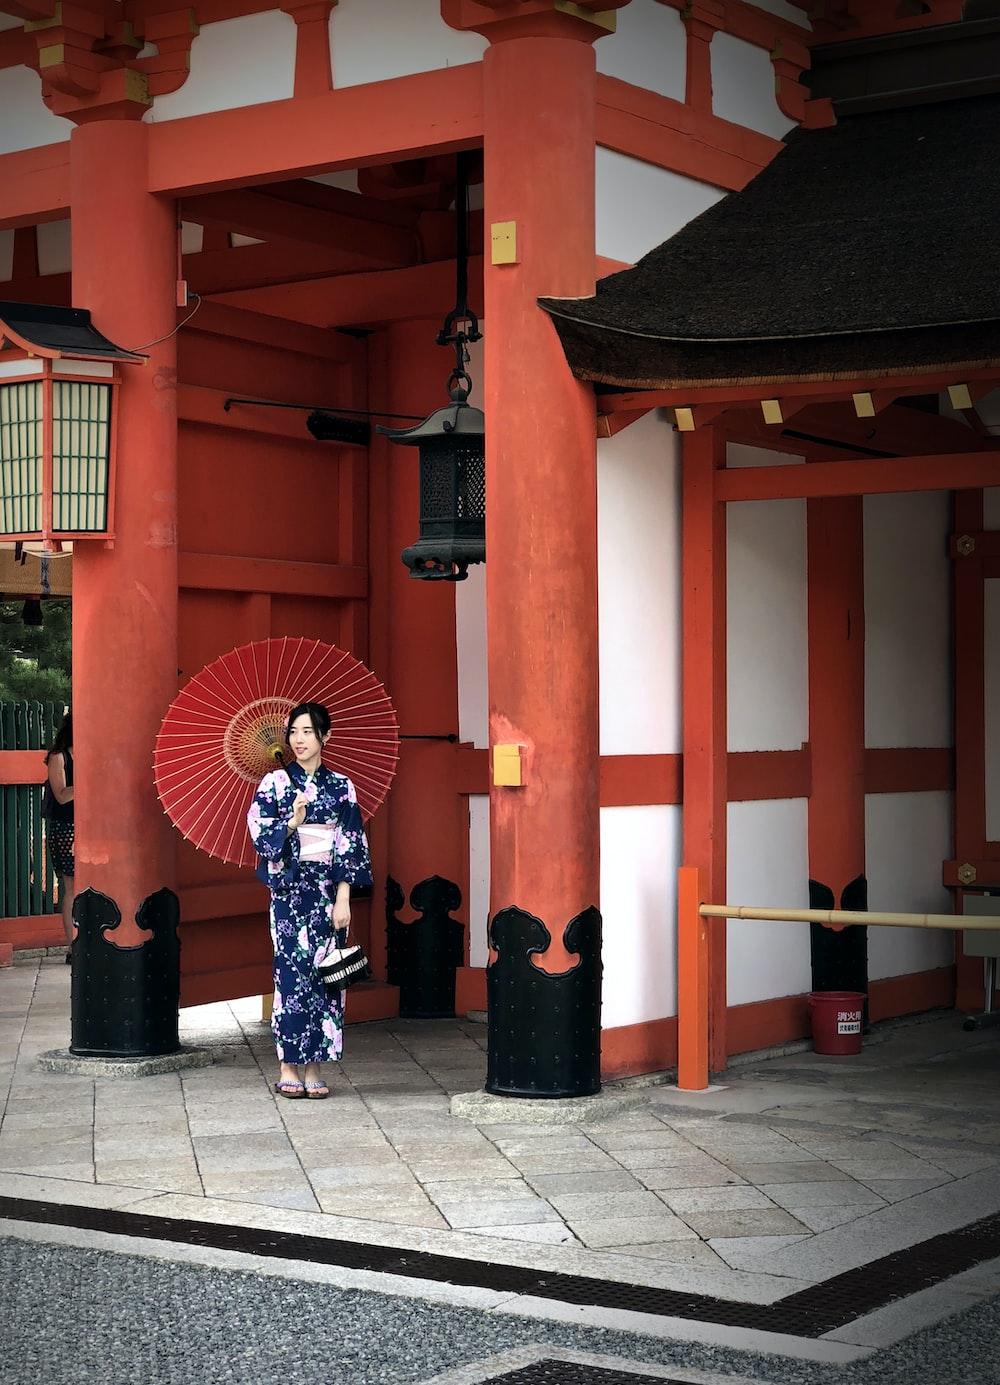 woman wearing yukata with red umbrella